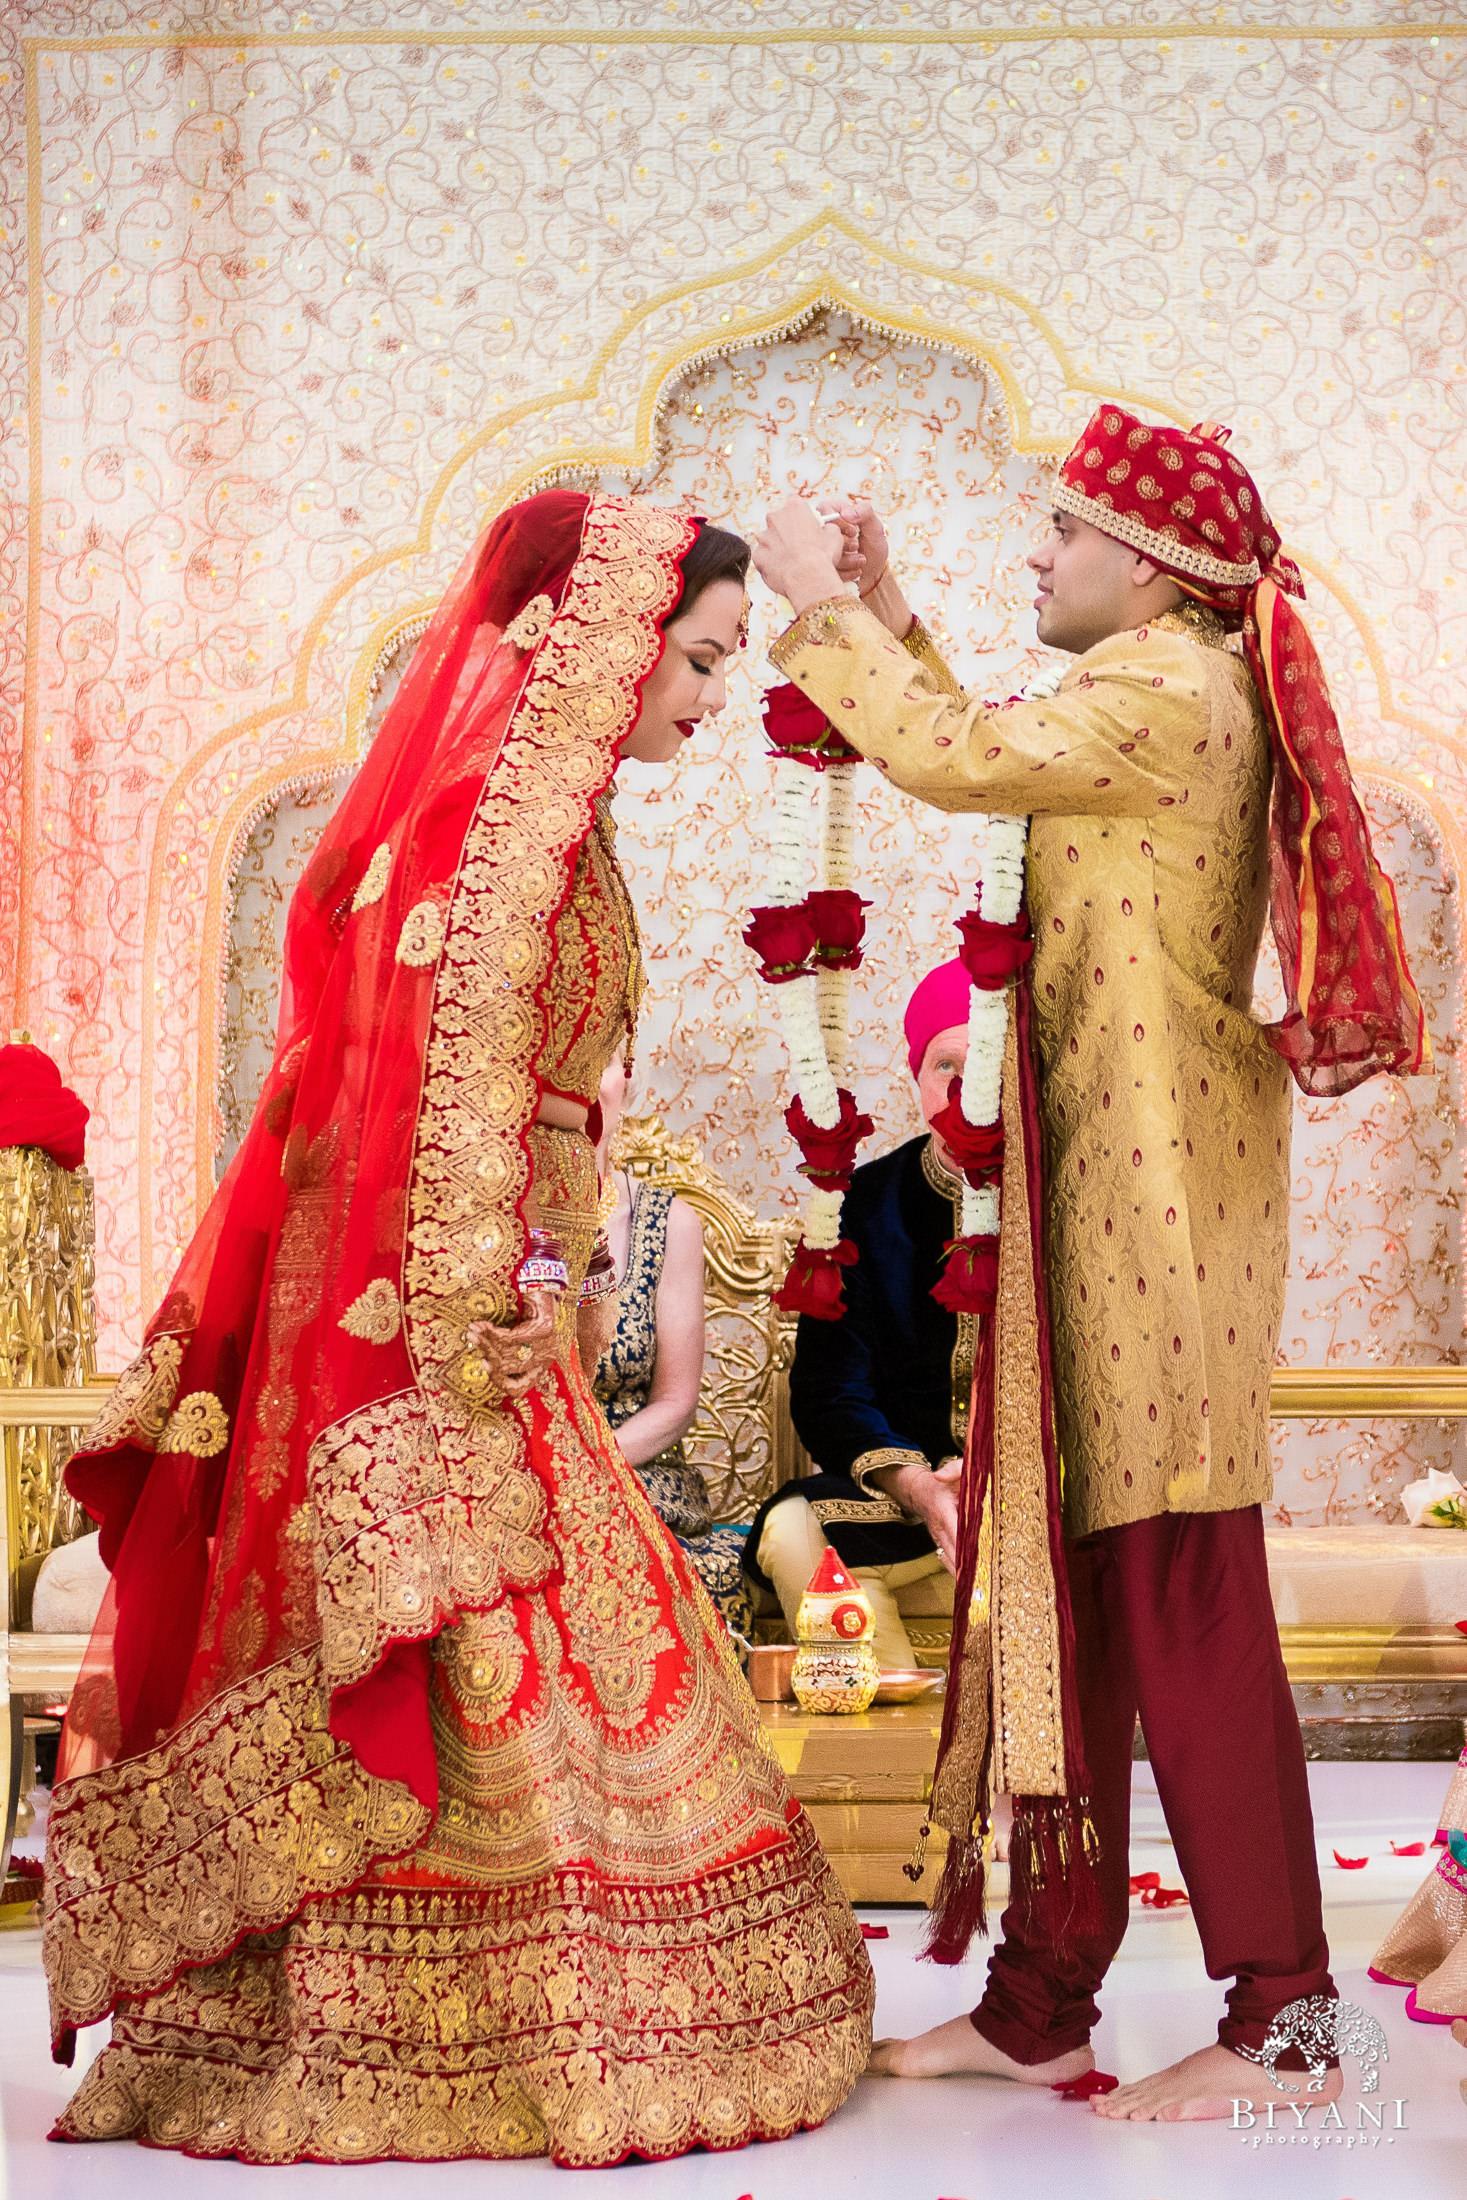 Groom adorns bride with ceremony bands